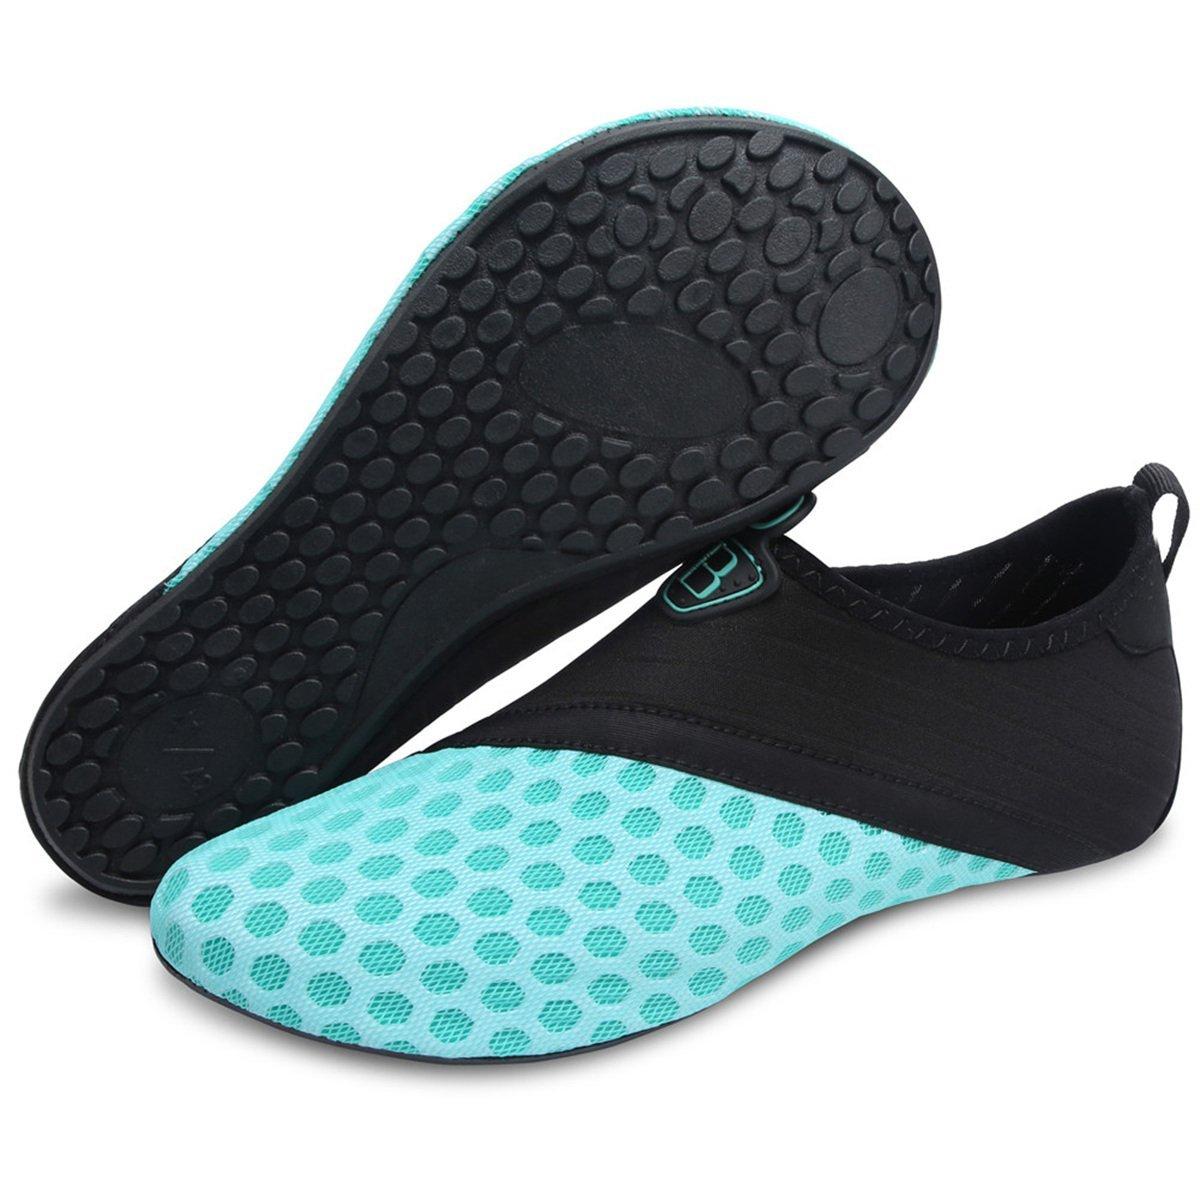 Barerun Barefoot Quick-Dry Water Sports Shoes Aqua Socks for Swim Beach Pool Surf Yoga for Women Men 8.5-9.5 US Women